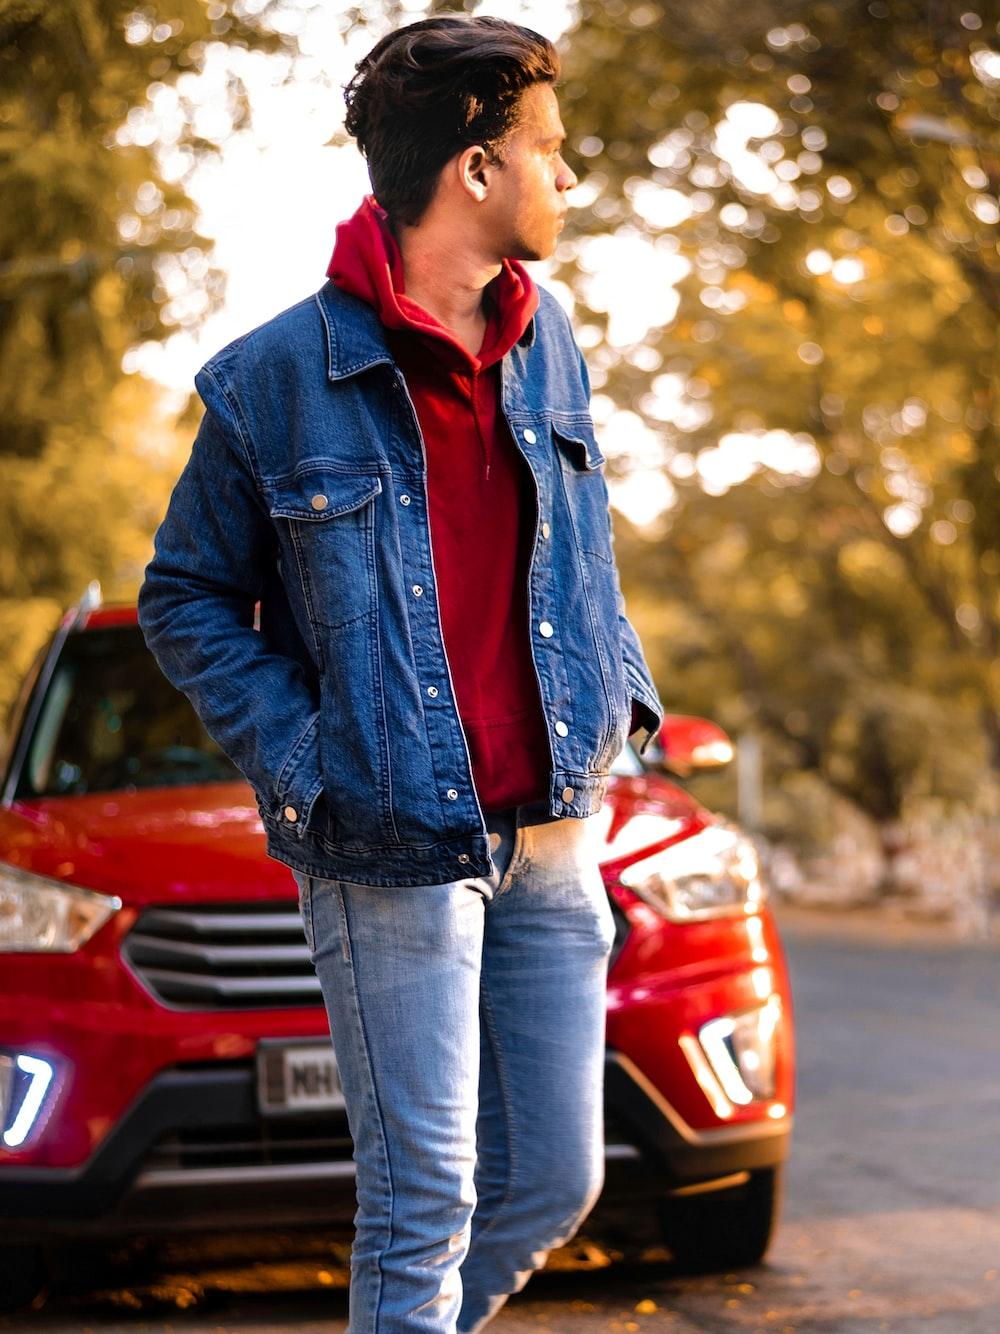 man wearing blue denim jacket standing near red vehicle beside road during daytime